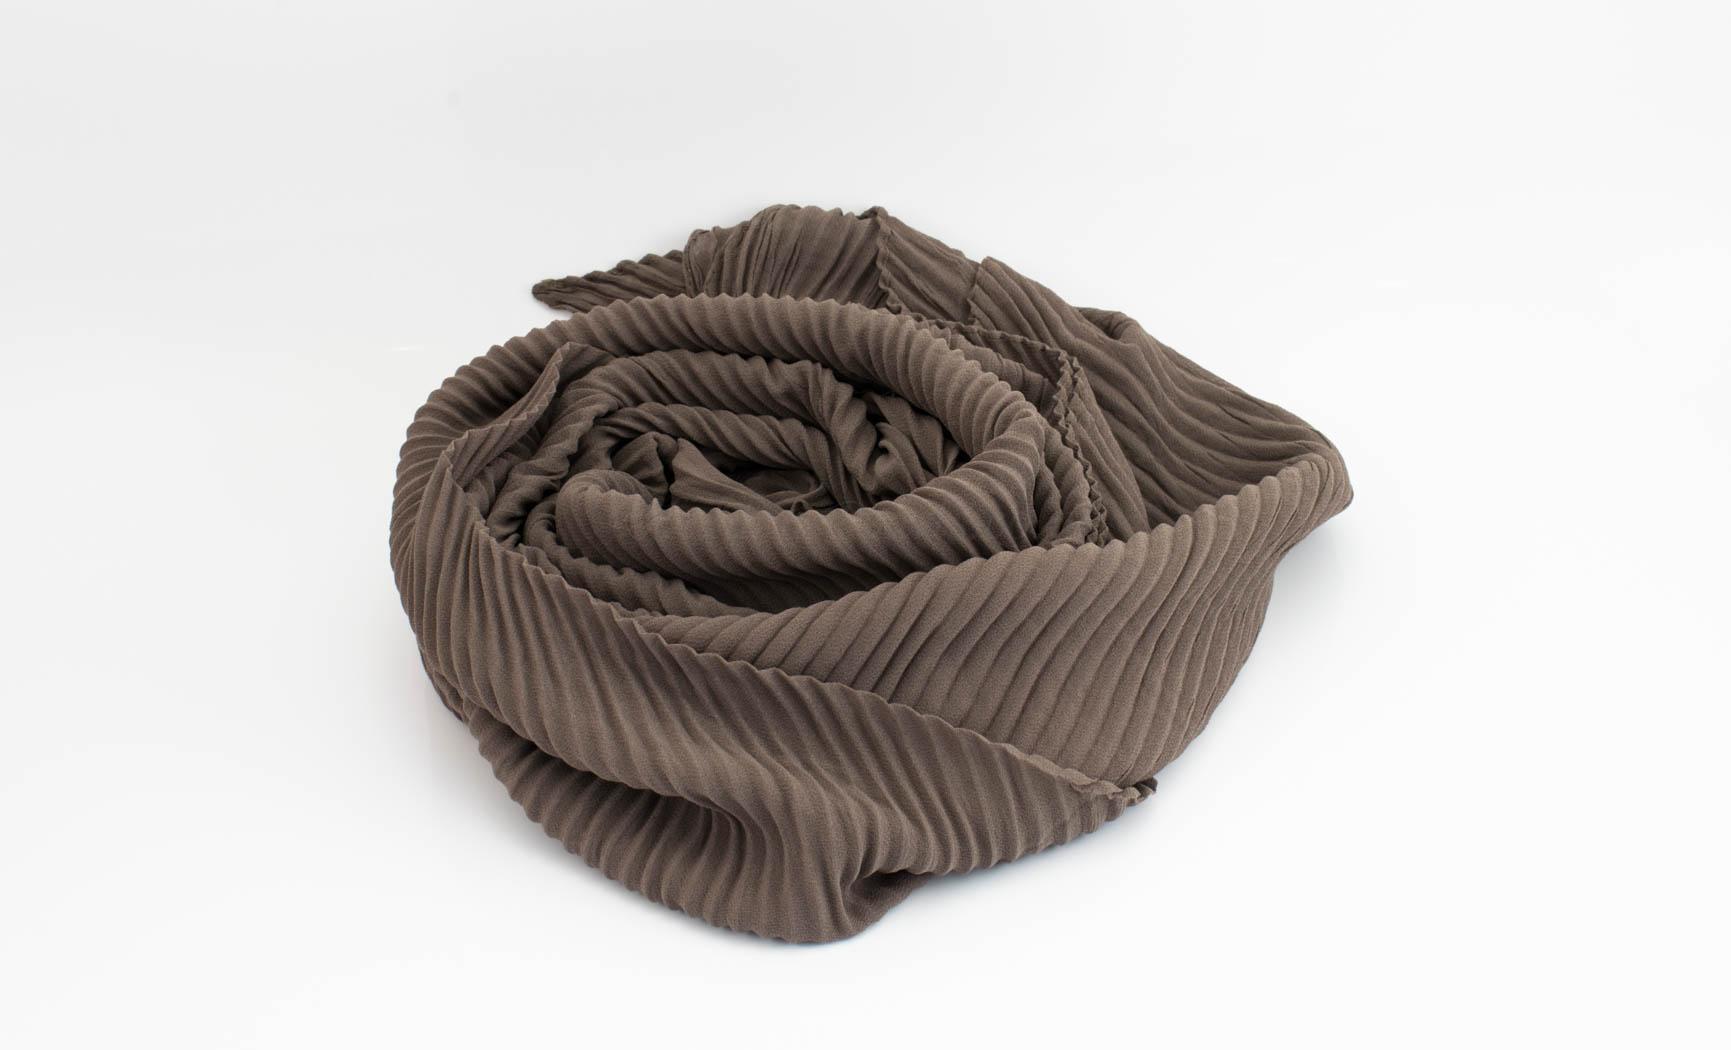 Crinkle Chiffon Hijab - Taupe Brown 2 - Hidden Pearls